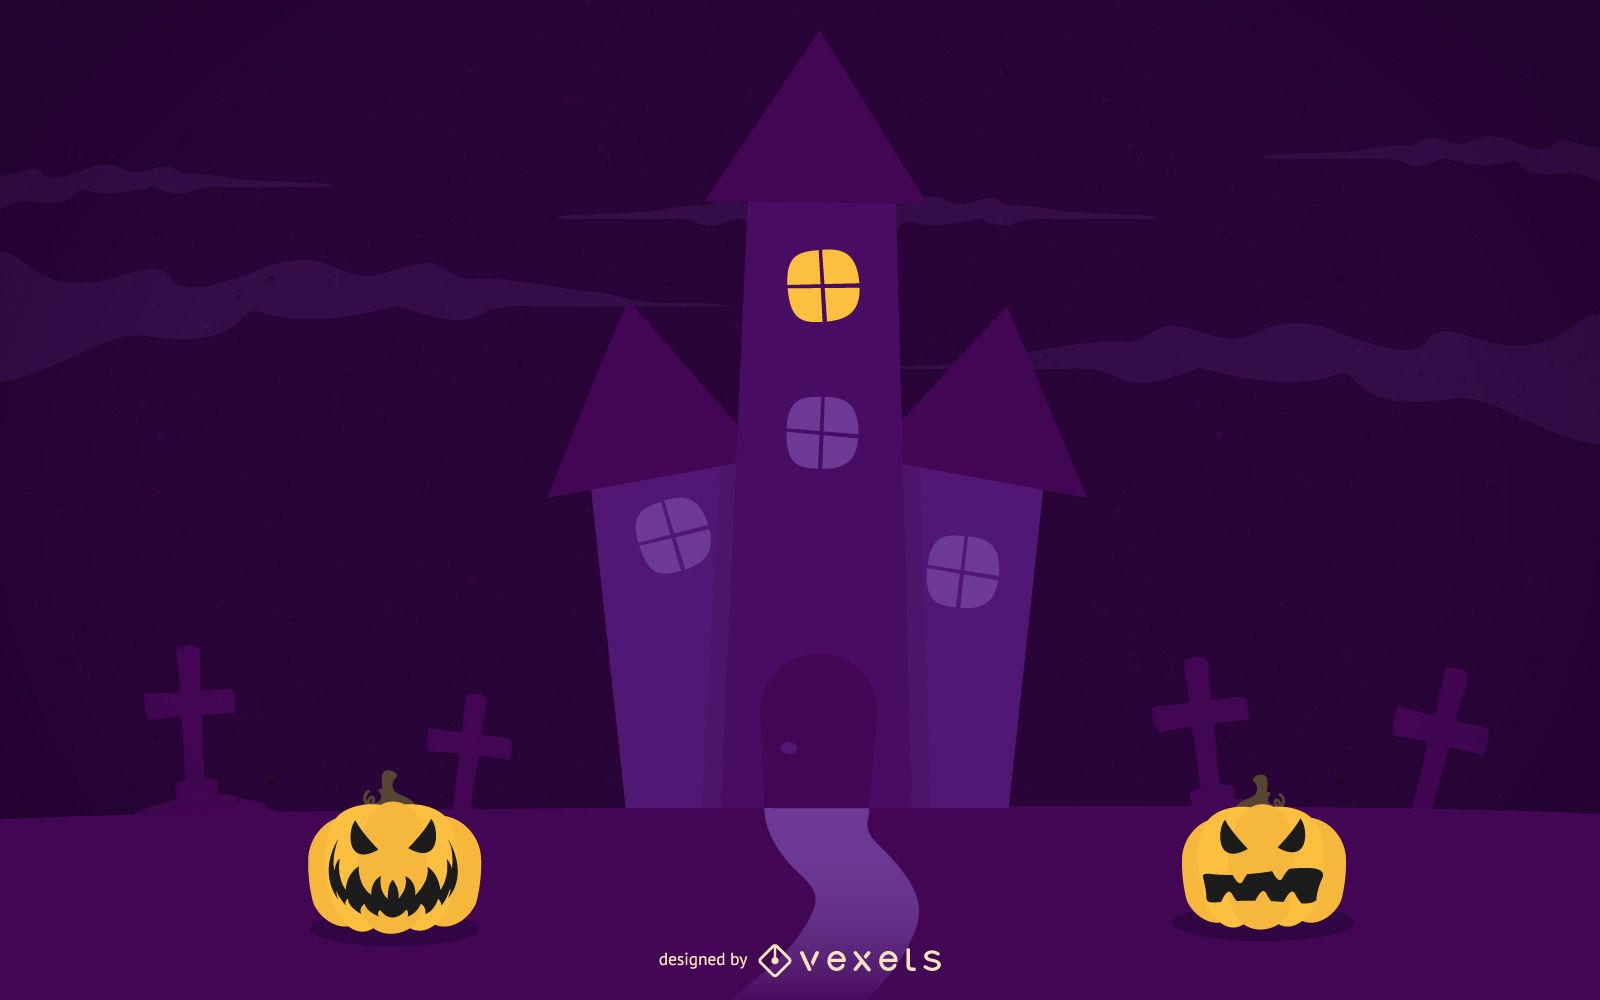 Halloween Night Creepy Purple Poster Template